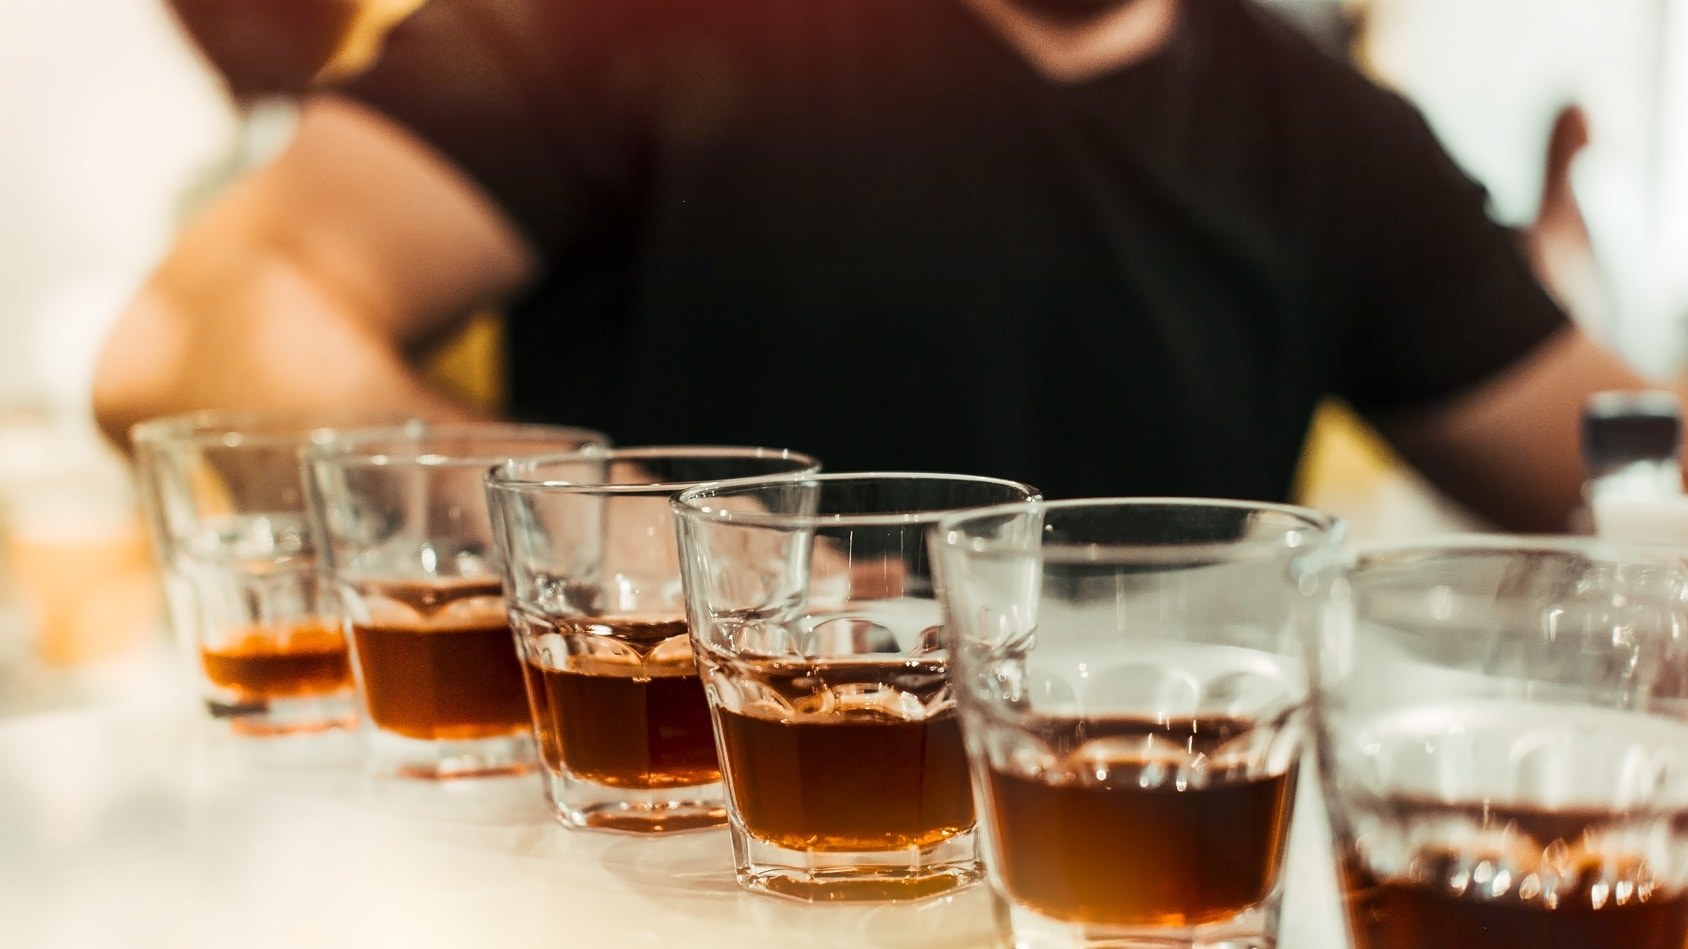 Cupping – profesjonalna degustacja kawy